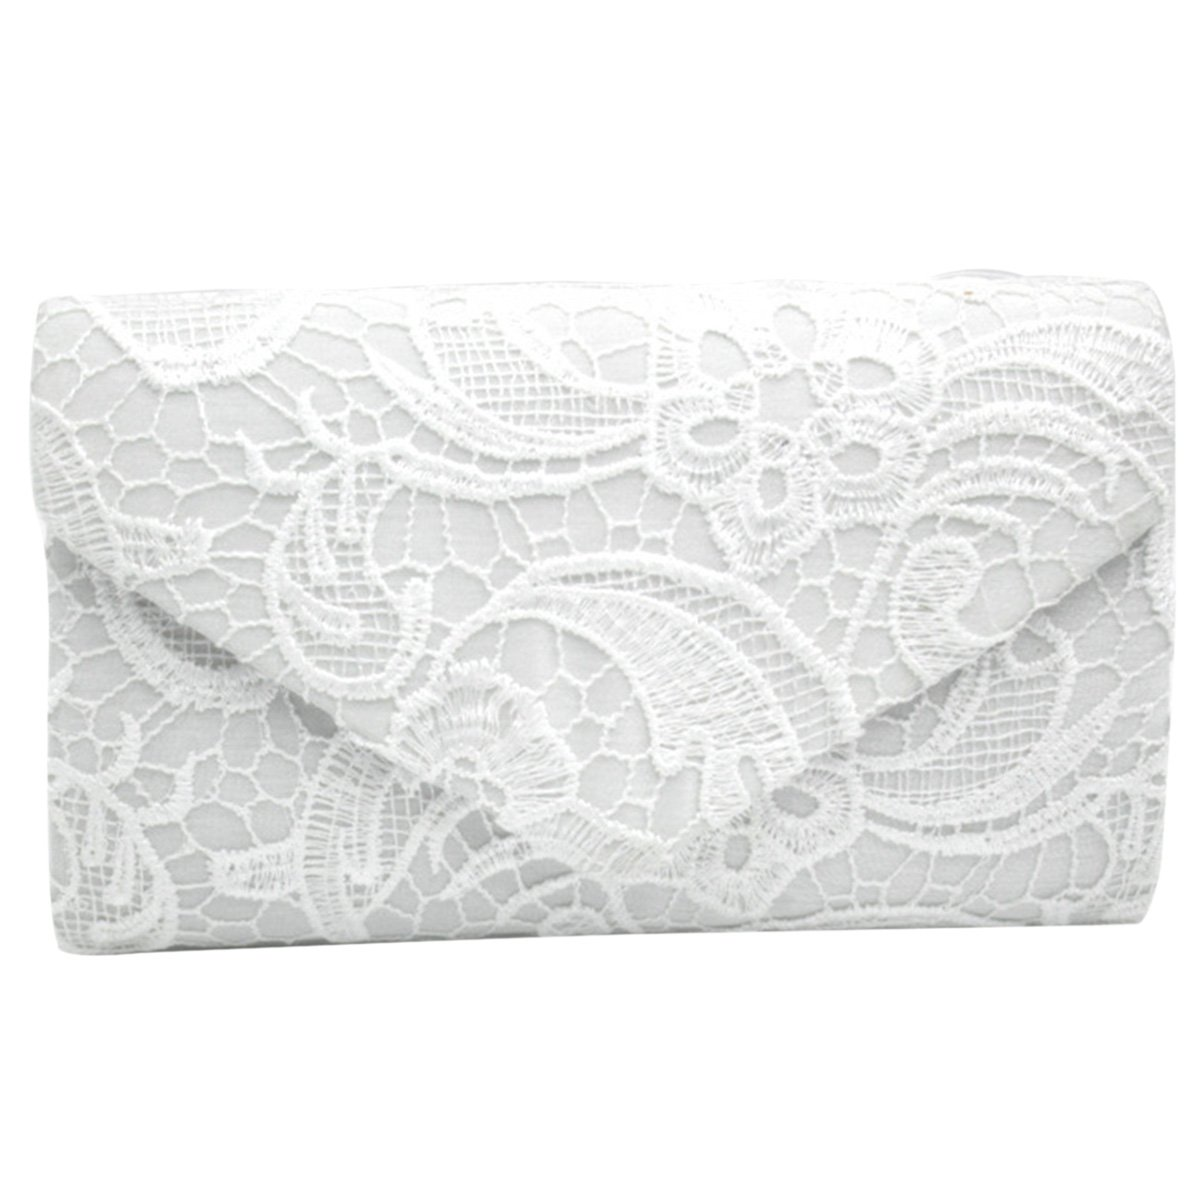 Sasairy Ladies Evening Bag Floral Lace Envelope Clutch Party Prom Purse Handbag